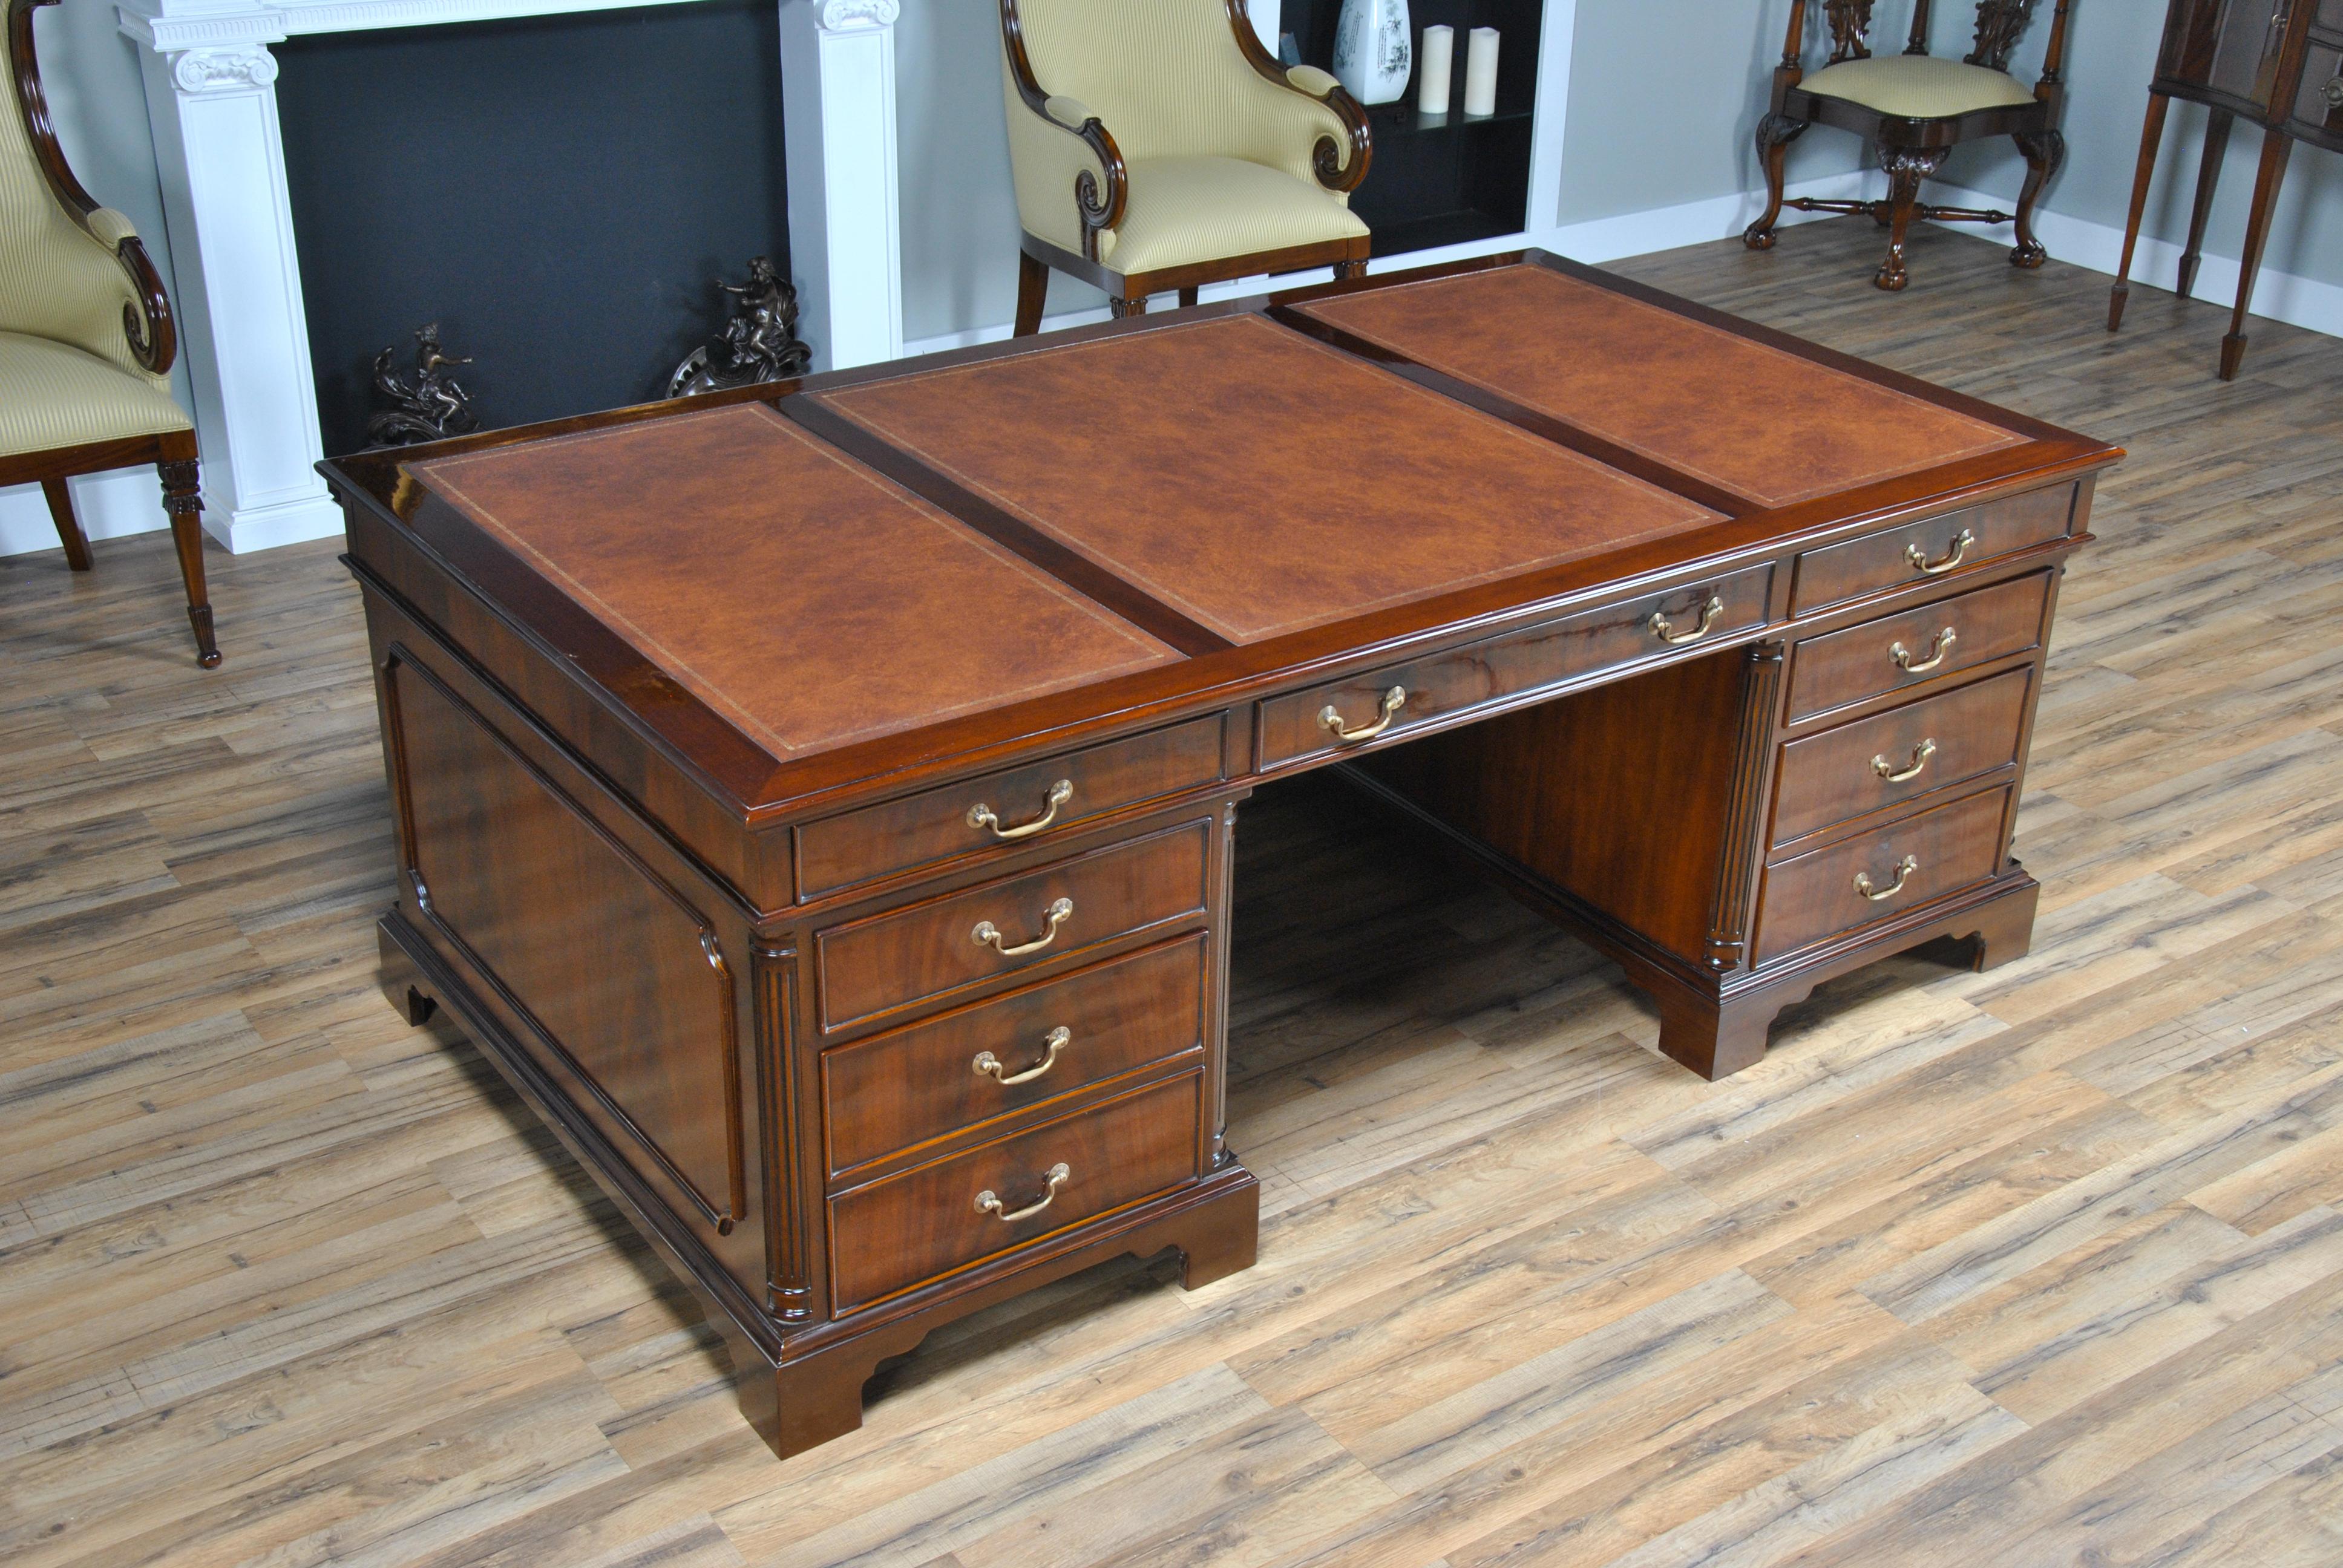 Huge Partners Desk, Niagara Furniture, Large Leather Top Desk